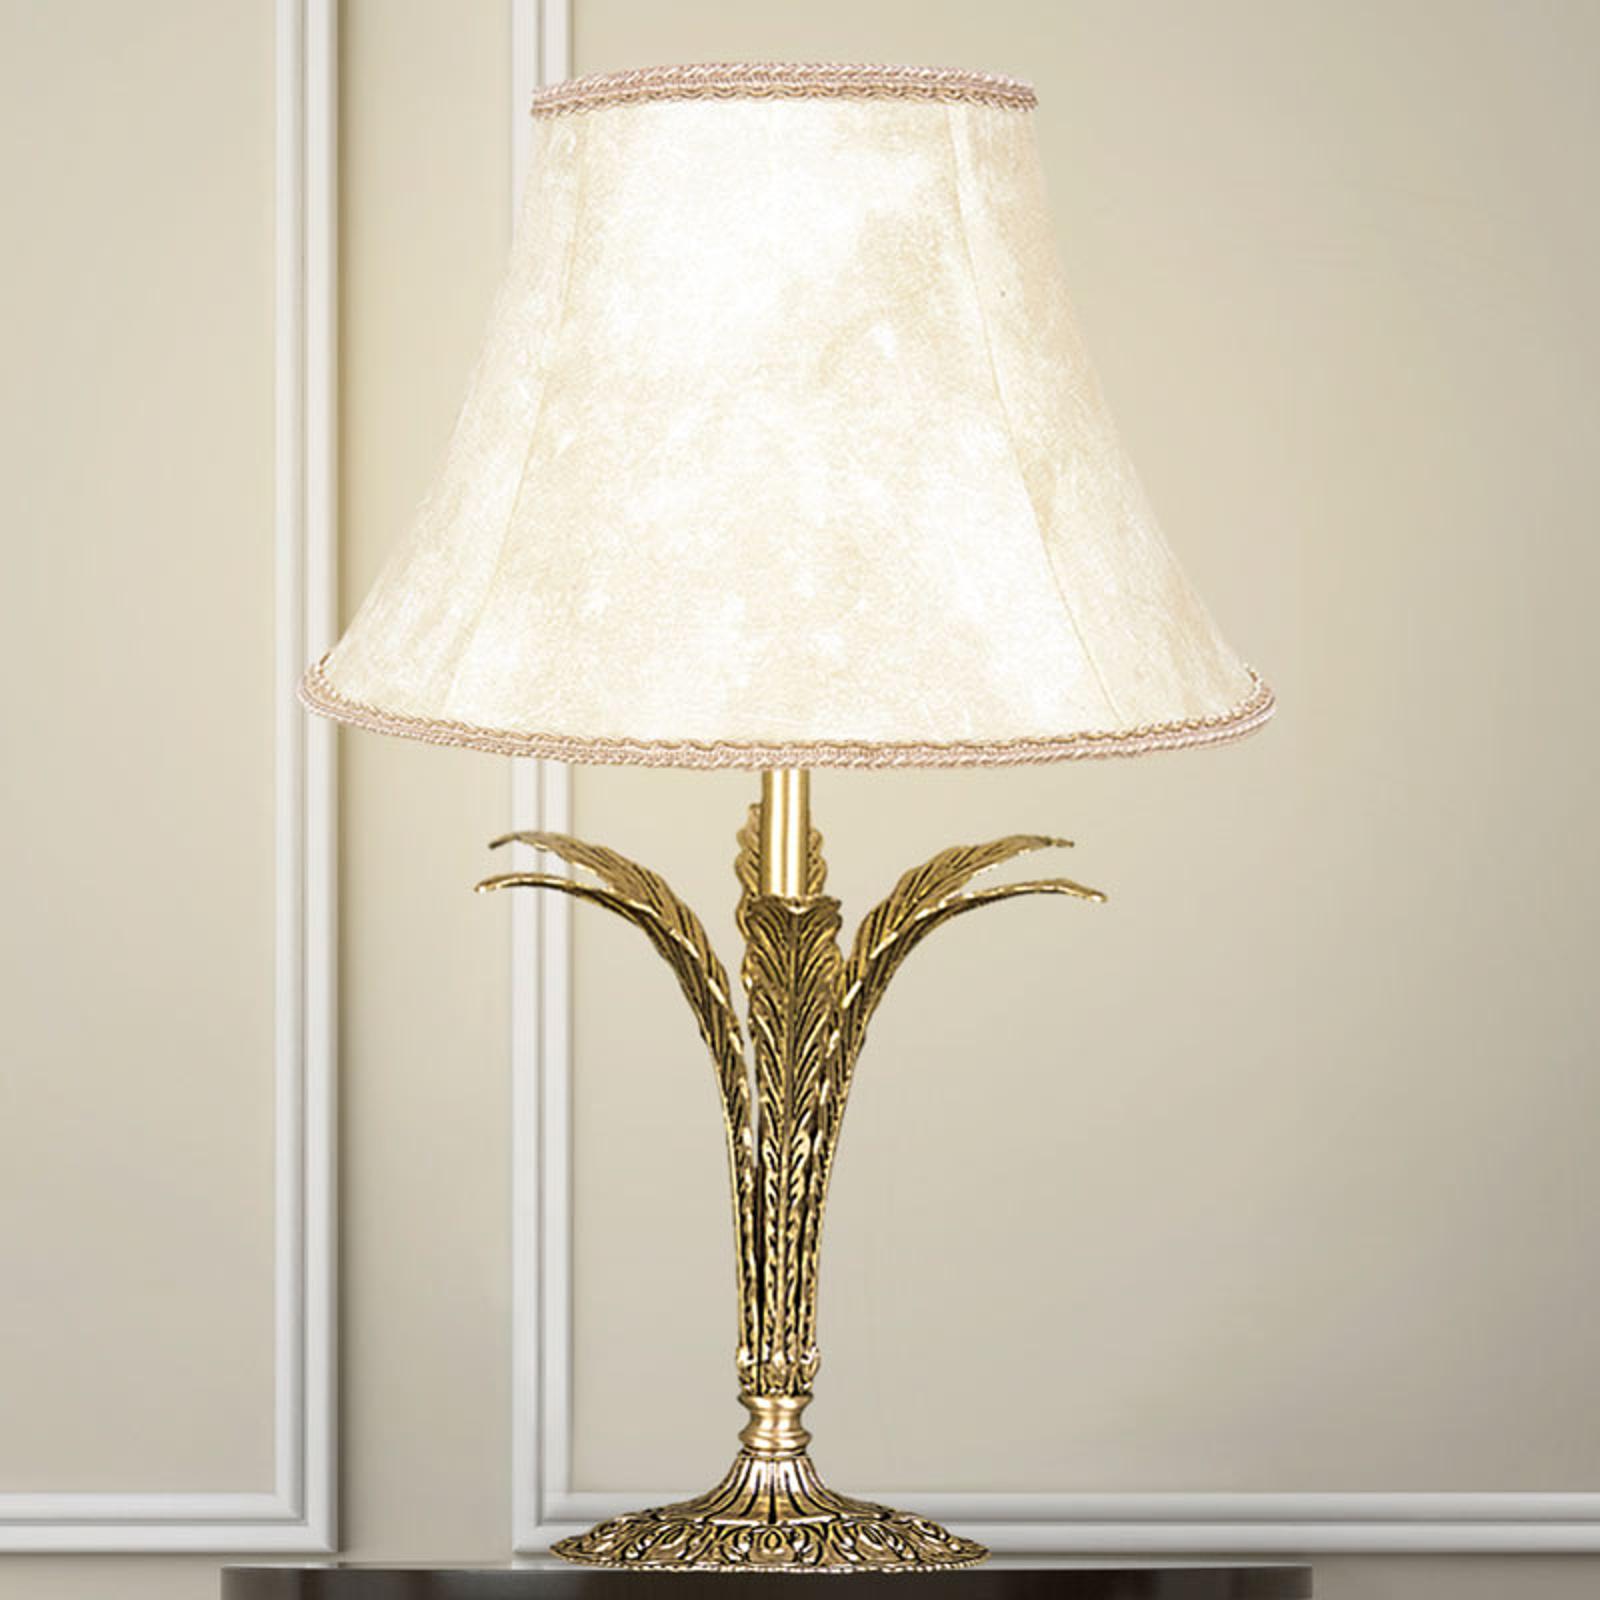 Bordlampe Palmera, antik guld, 1 lyskilde